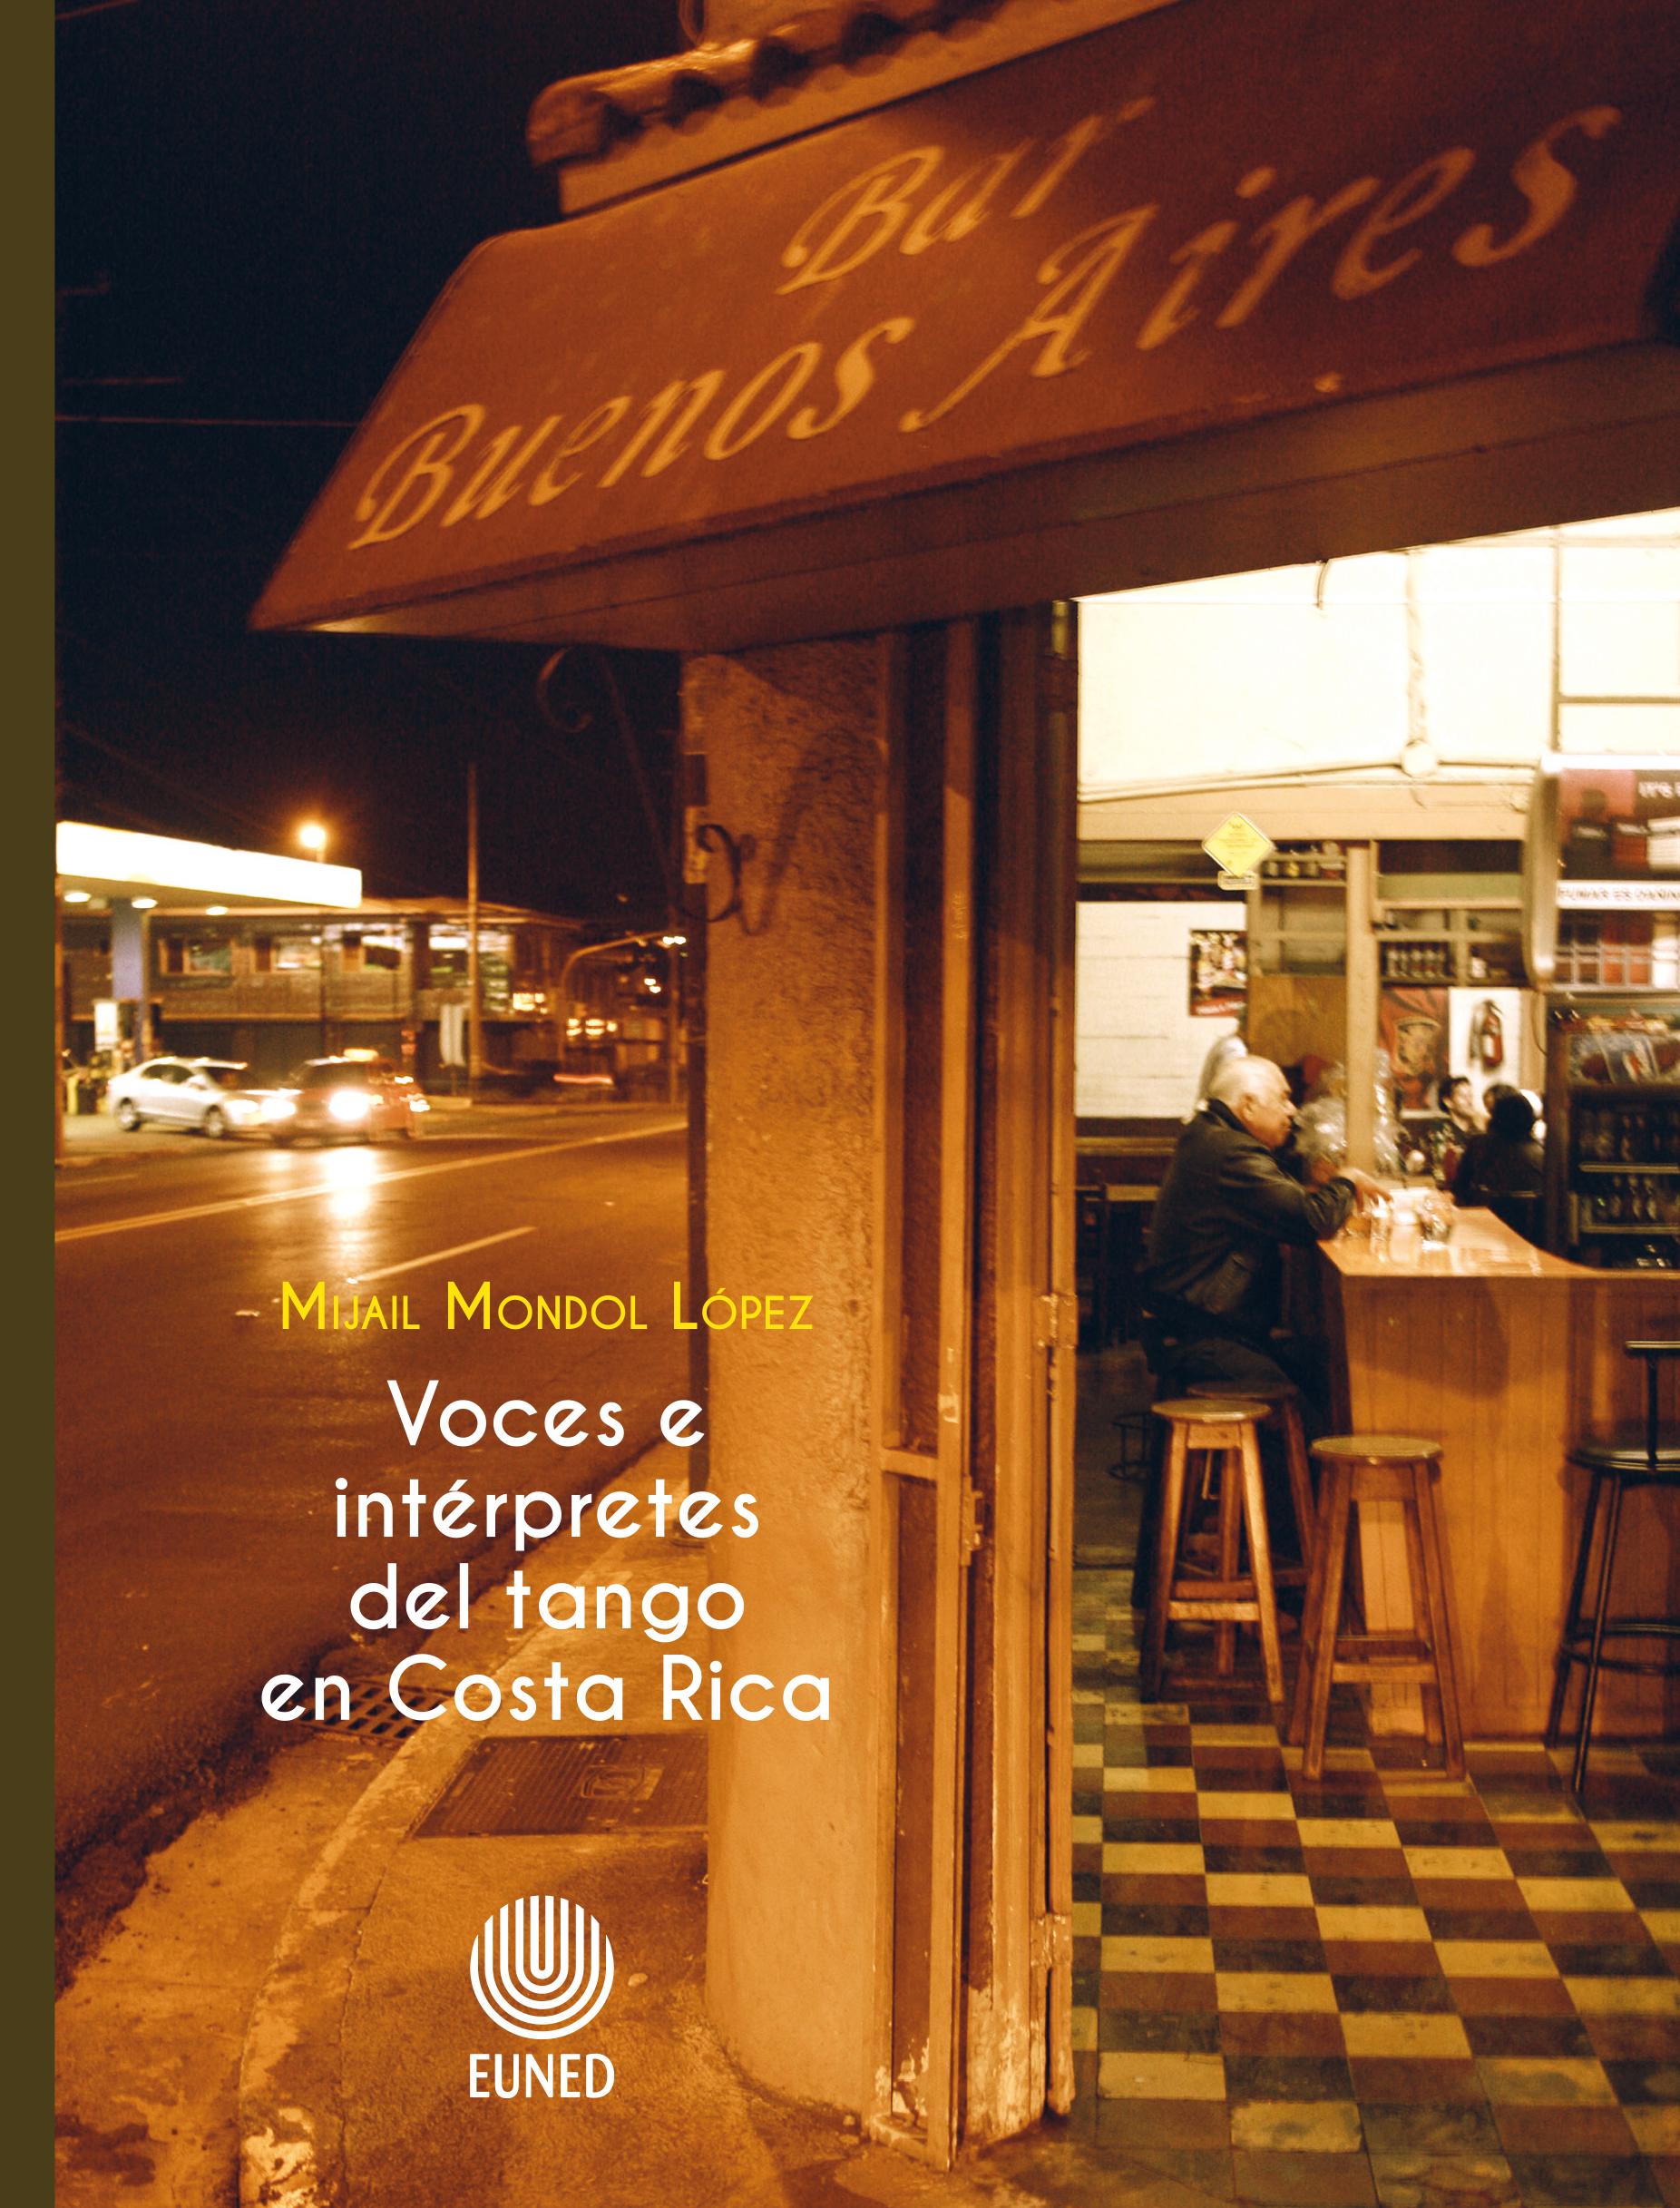 Voces e intérpretes del tango en Costa Rica